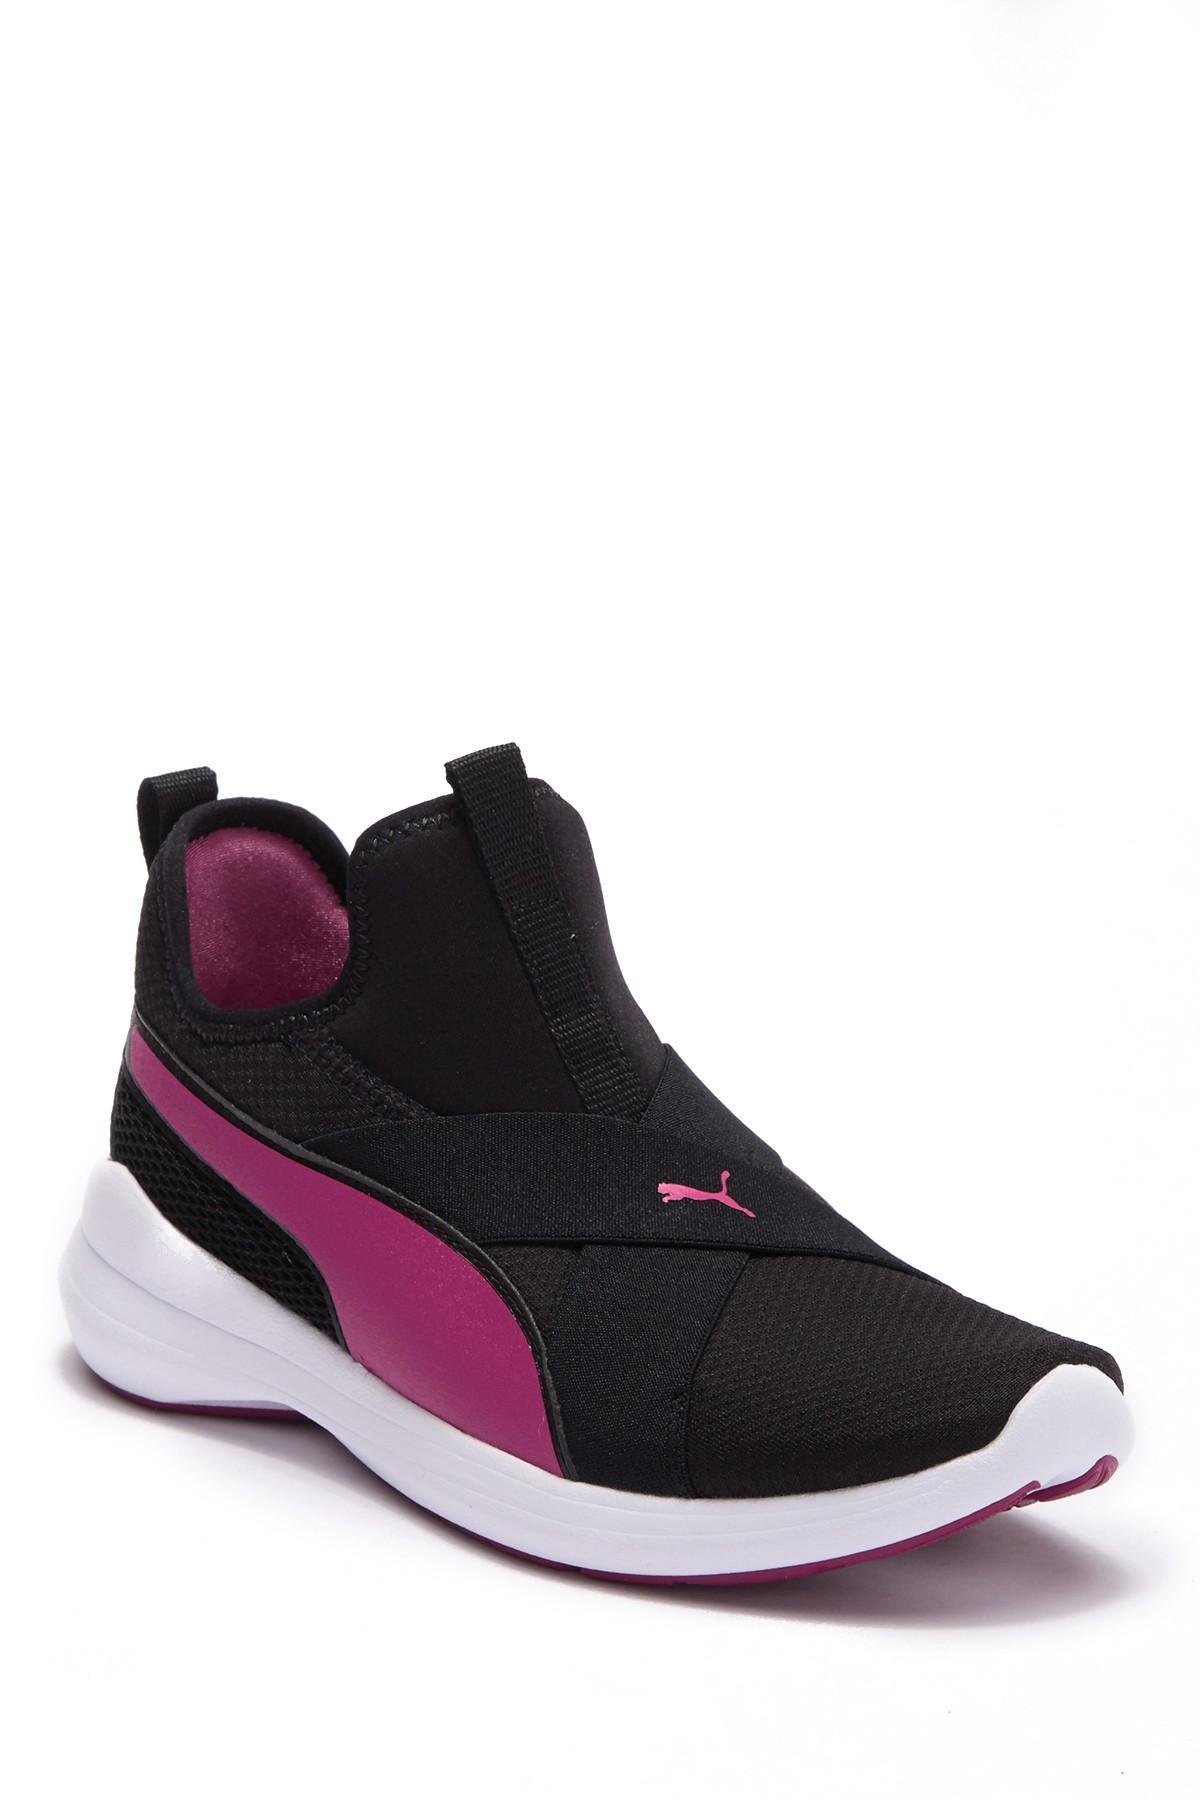 PUMA Rebel X Running Sneaker in Black - Lyst